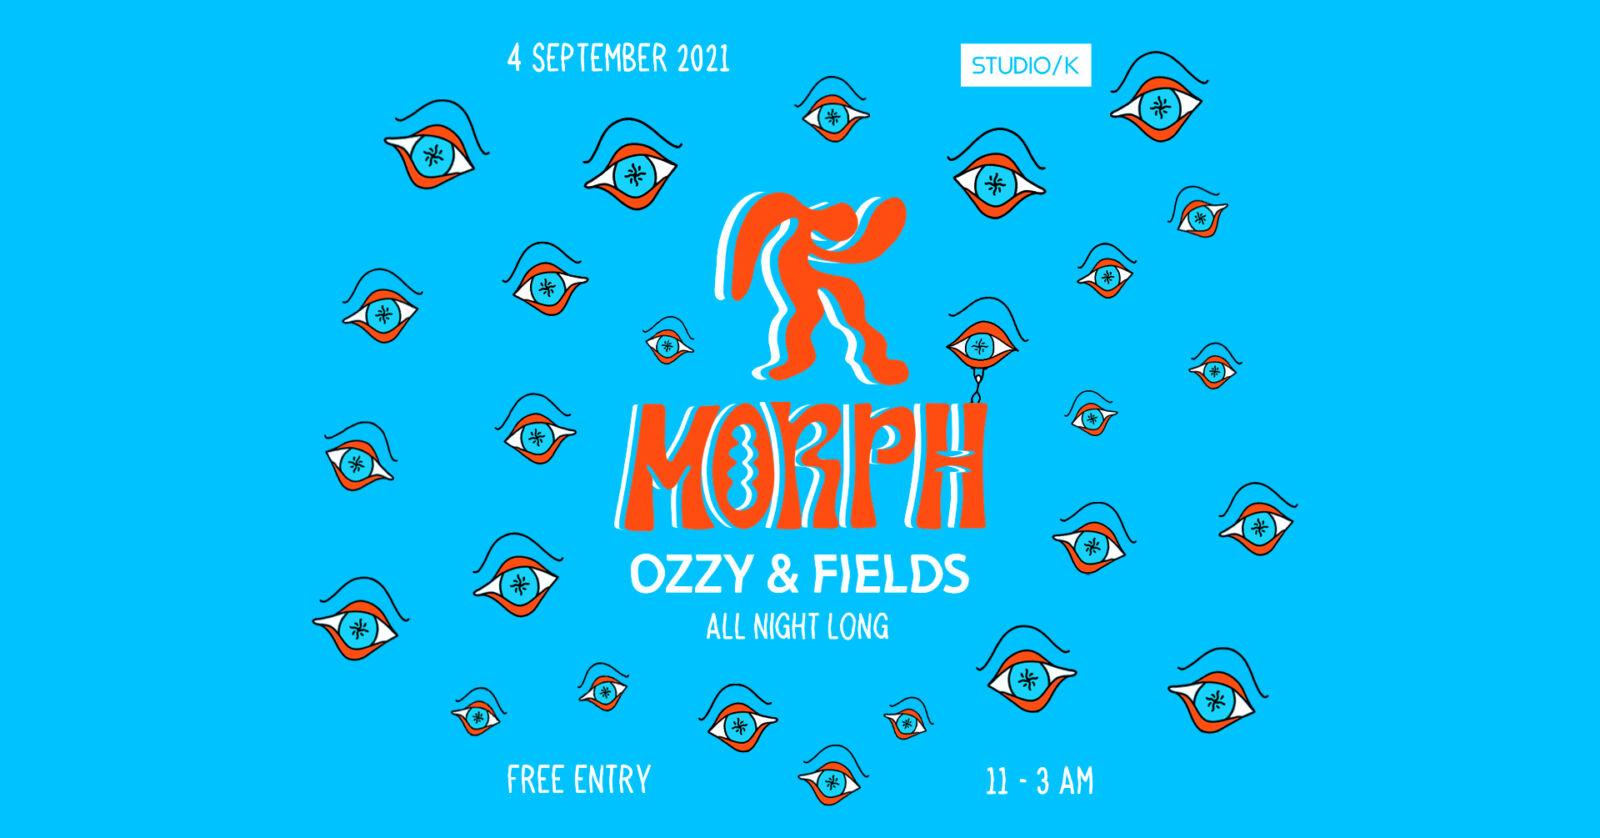 Morph at Studio/K (Ozzy & Fields all night long)